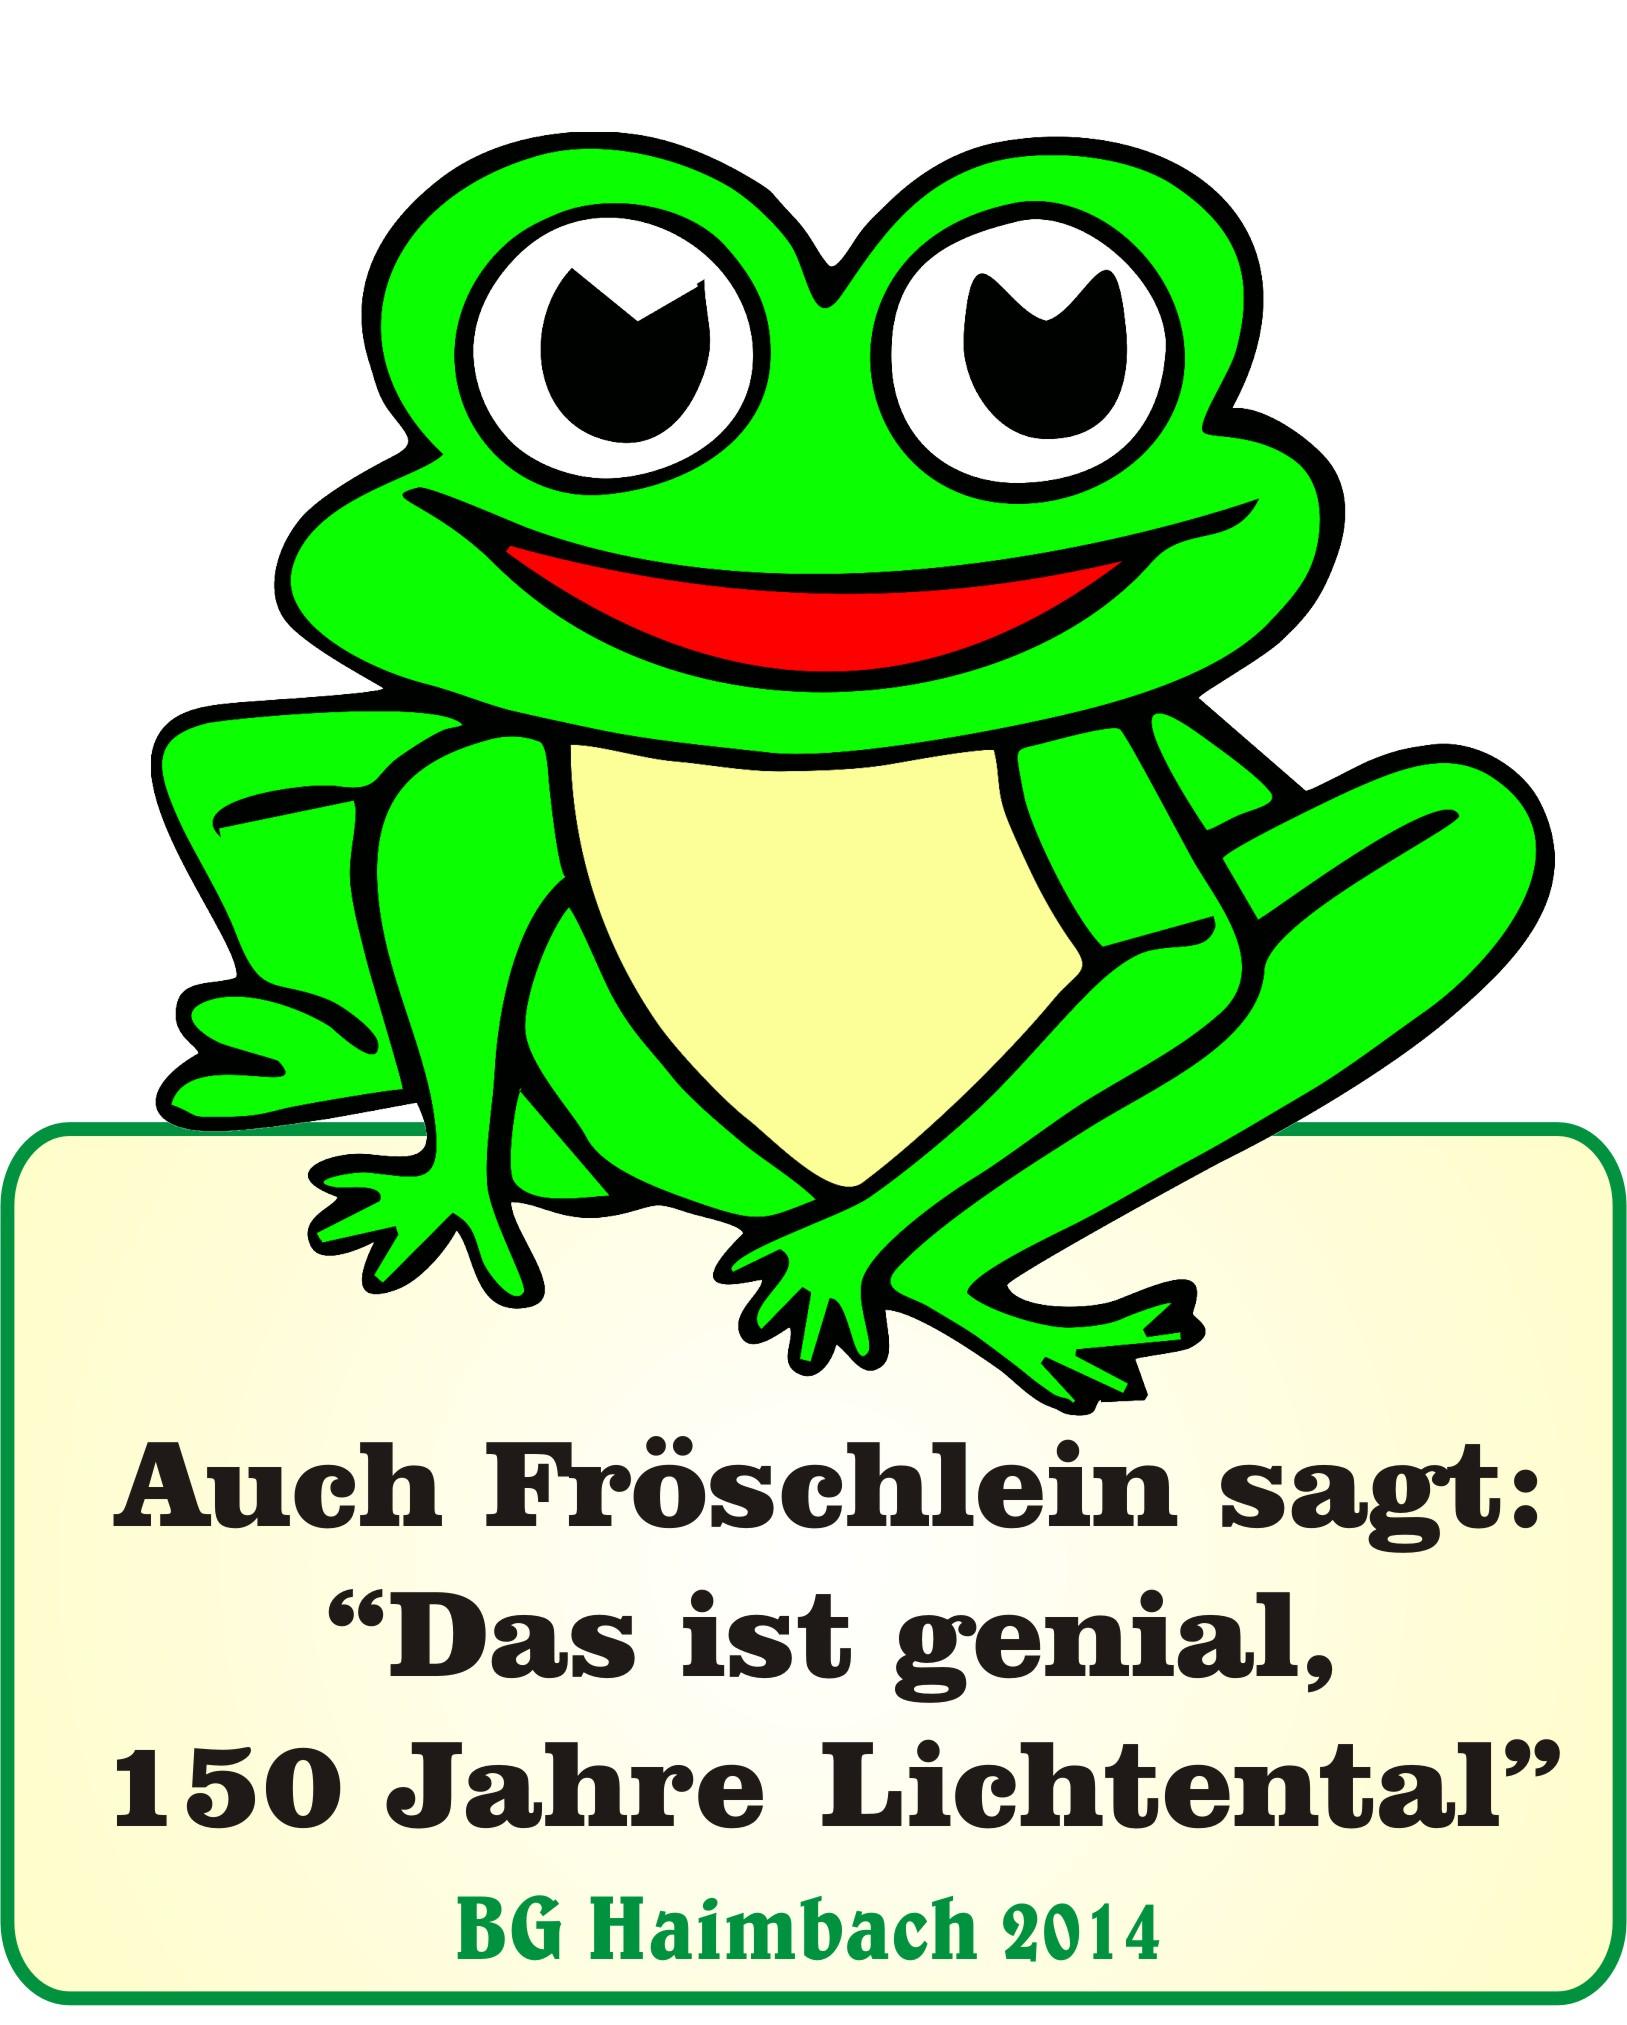 Bürgergemeinde Haimbach Lichtental e.V.